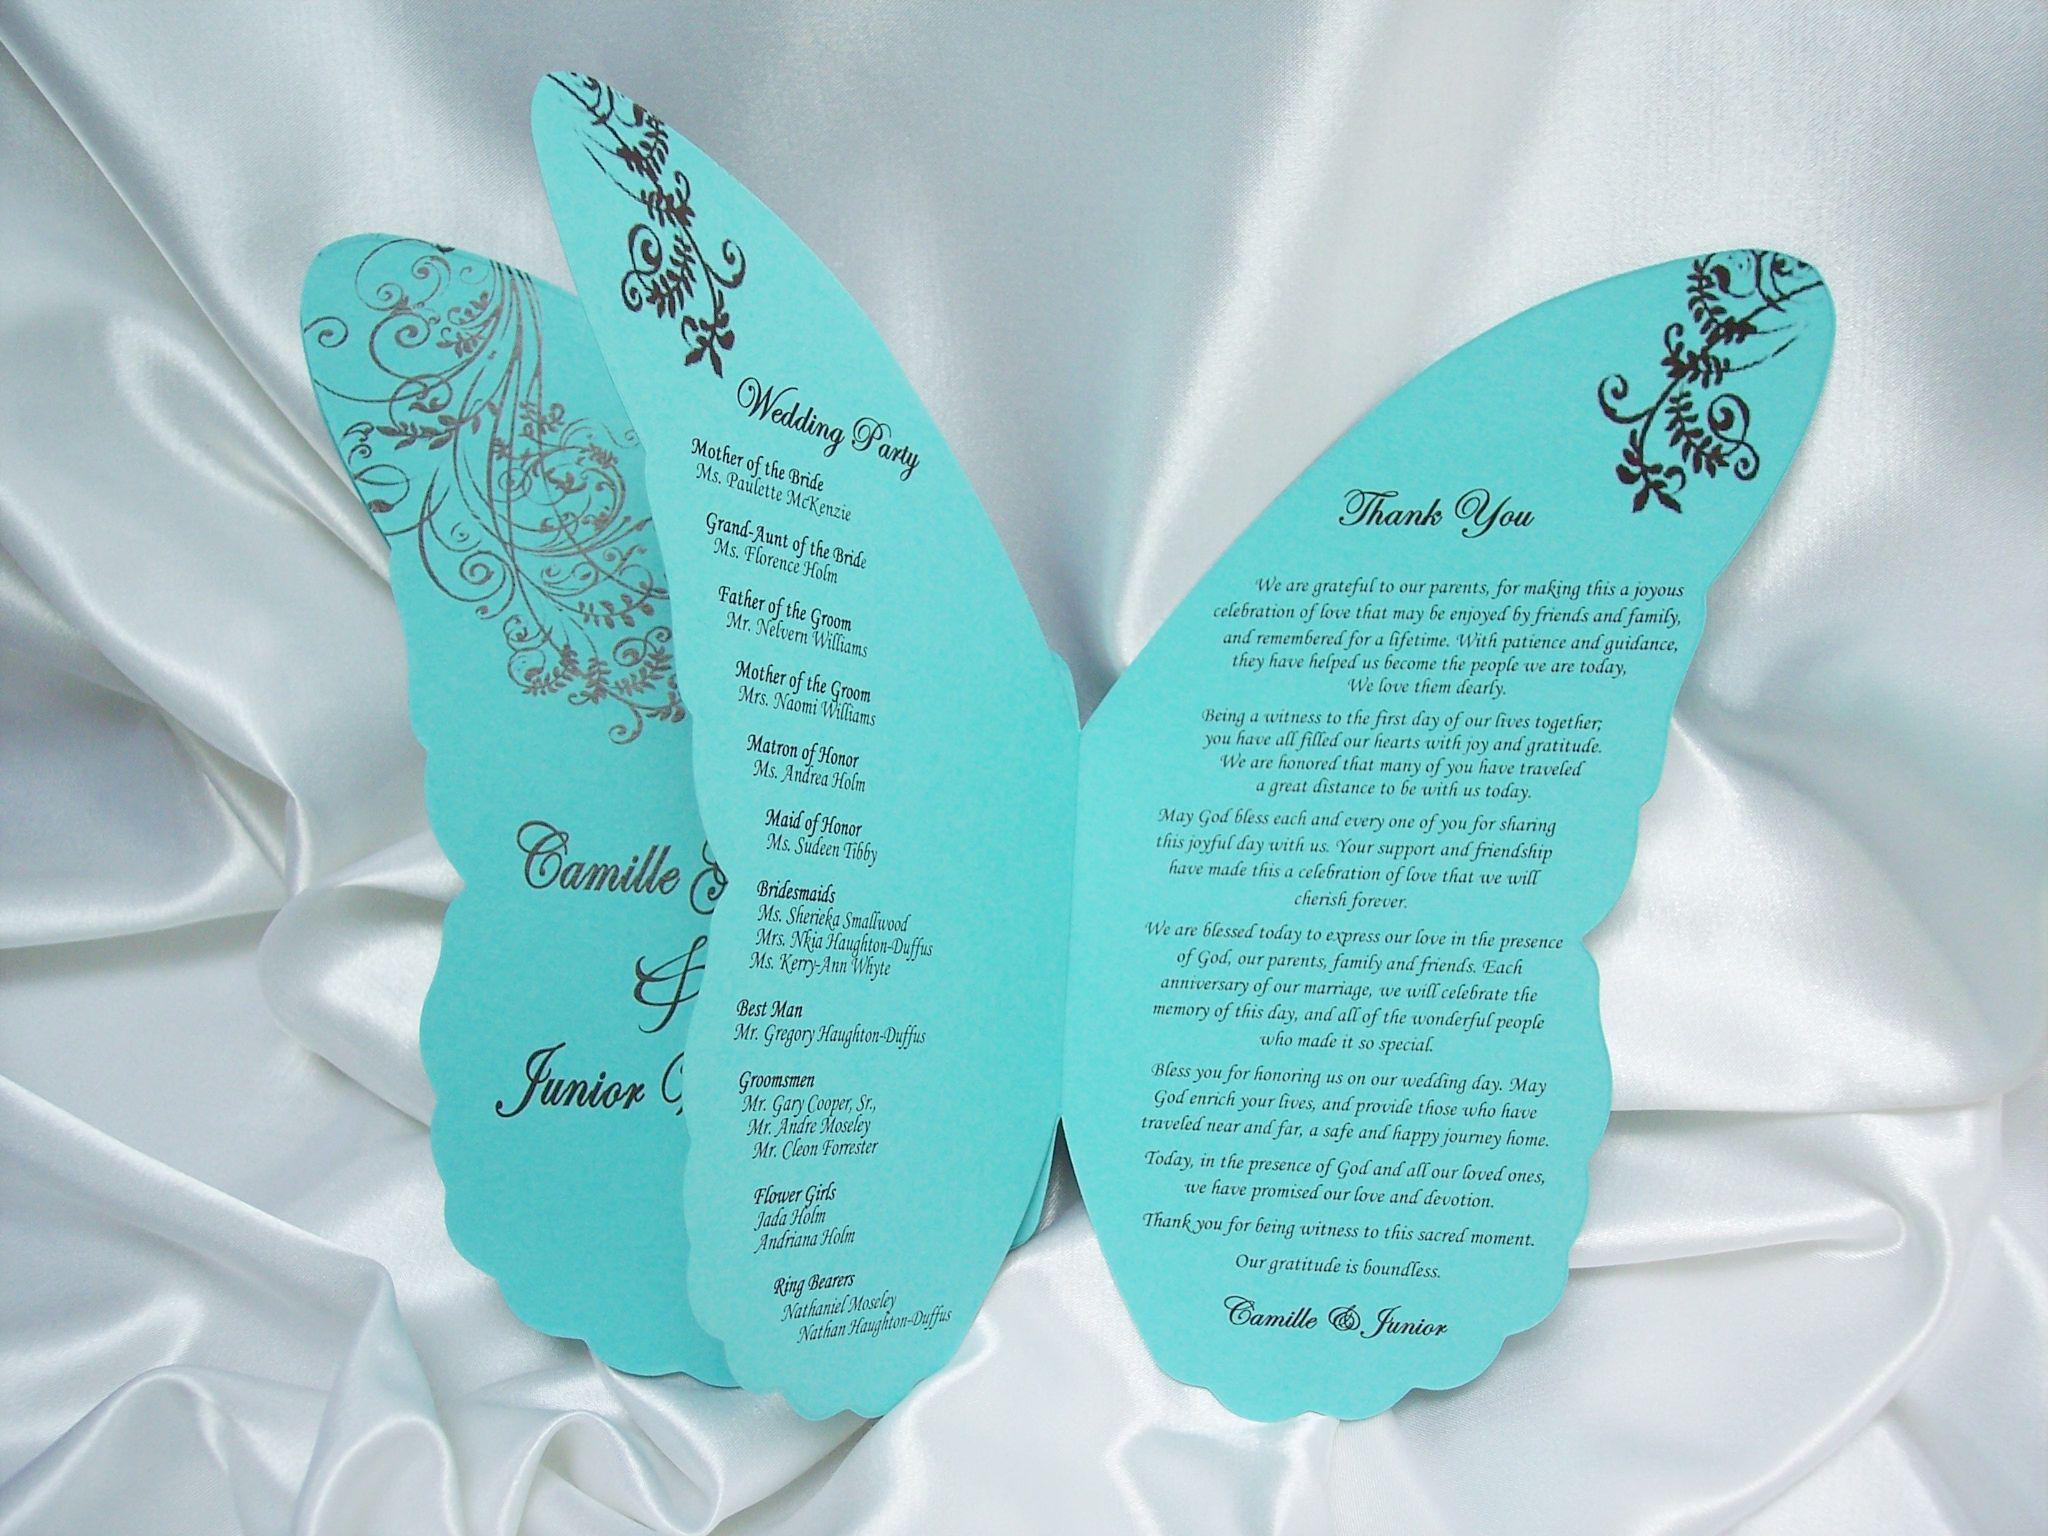 wedding e invitations www butterflies wedding inventations invitation templates christening invitation templates e invitations